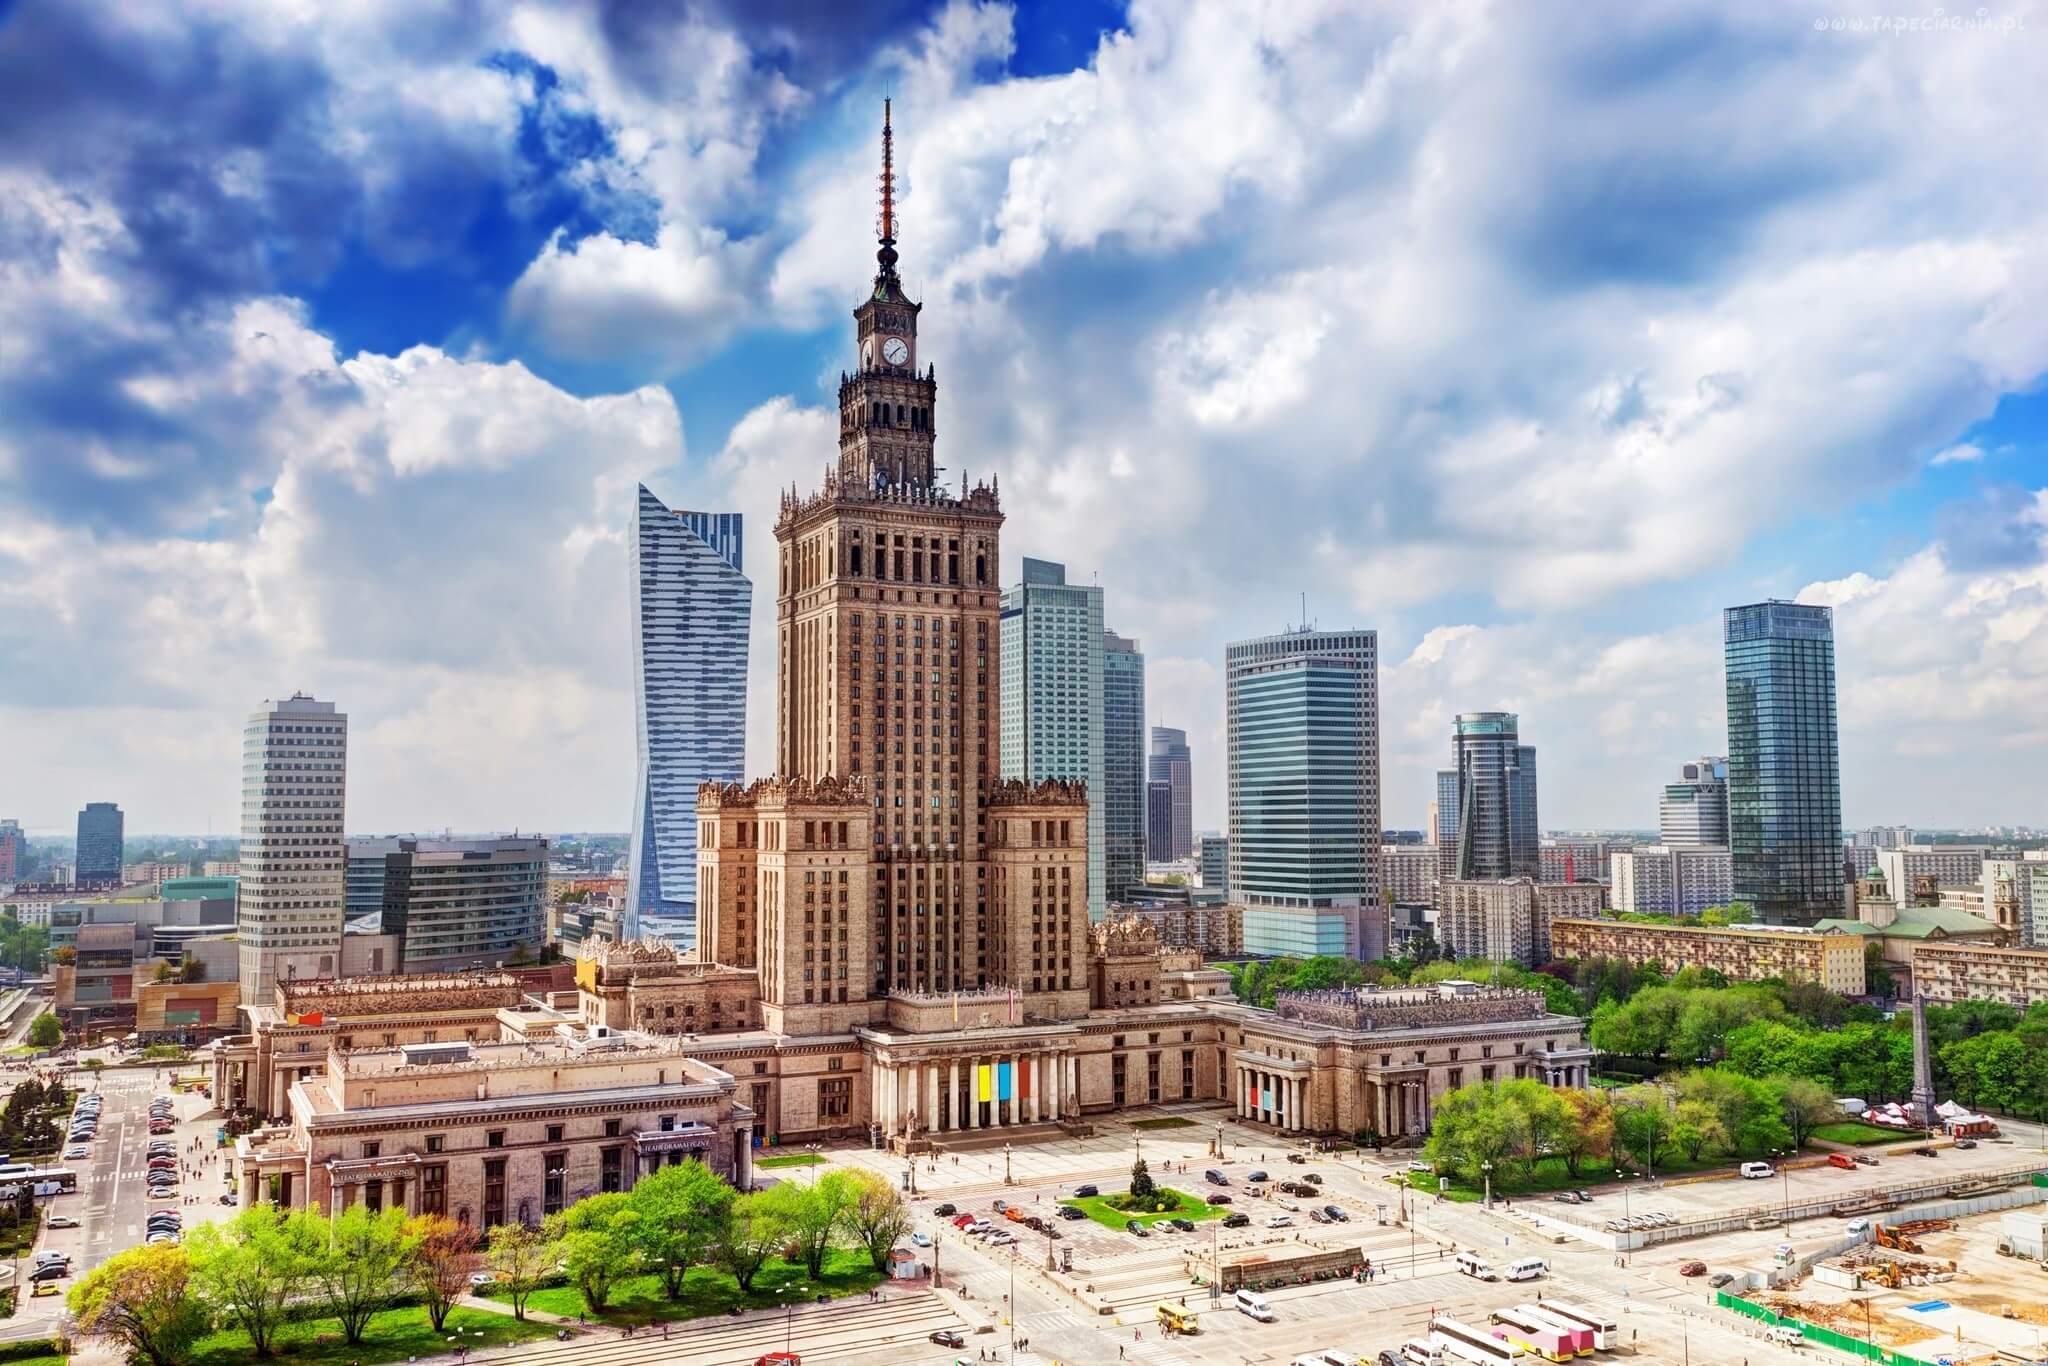 Дворец культуры и науки в Варшаве PKiN